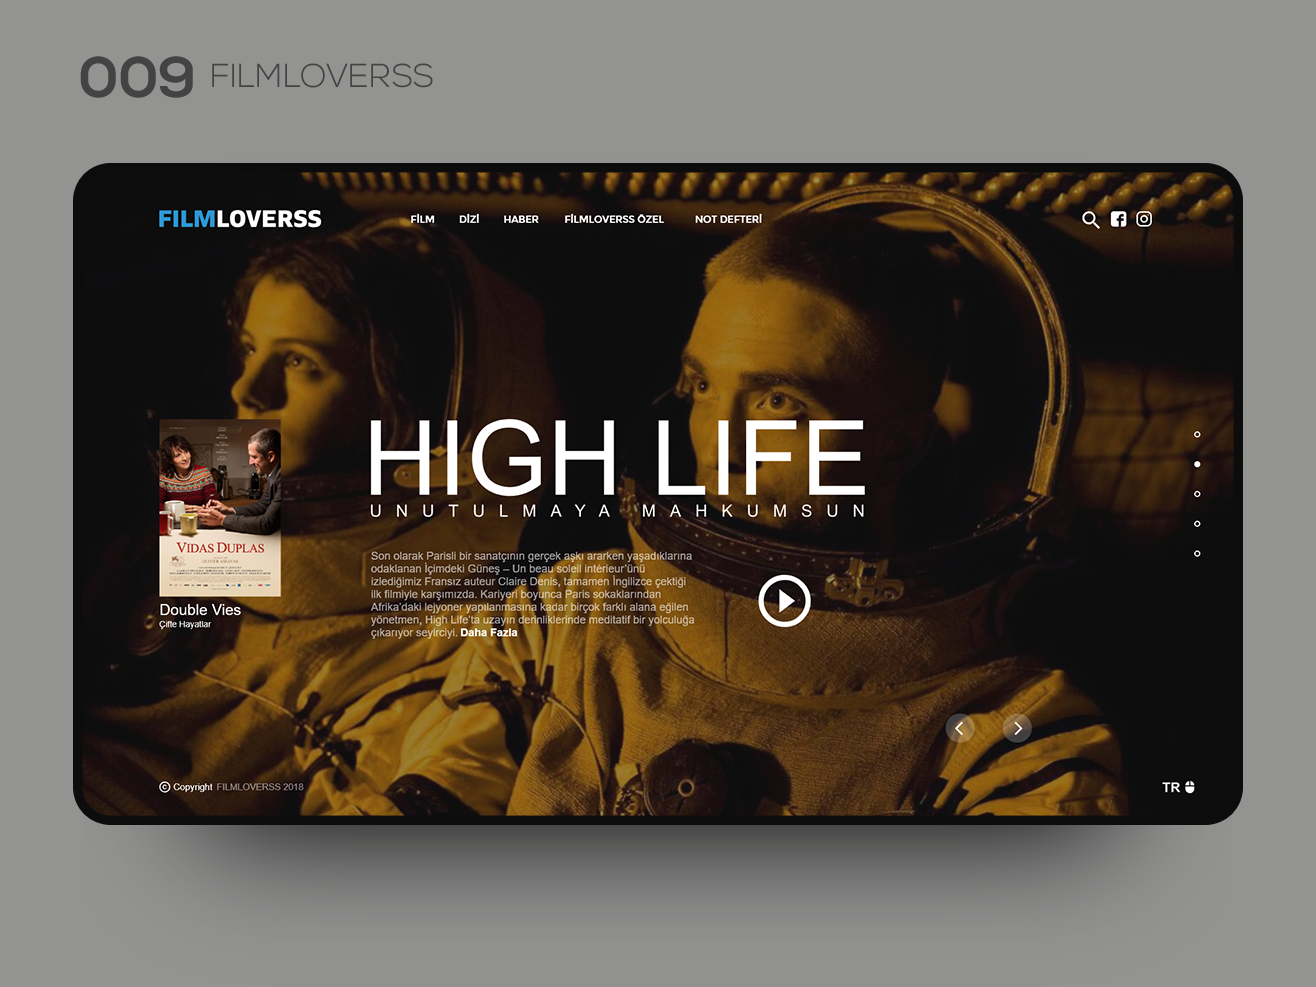 Daily UI 009 — FILMLOVERSS bootstrap movie film web design website interaction interface uidesign uxdesign ux design ux  ui uxui ux uiux ui